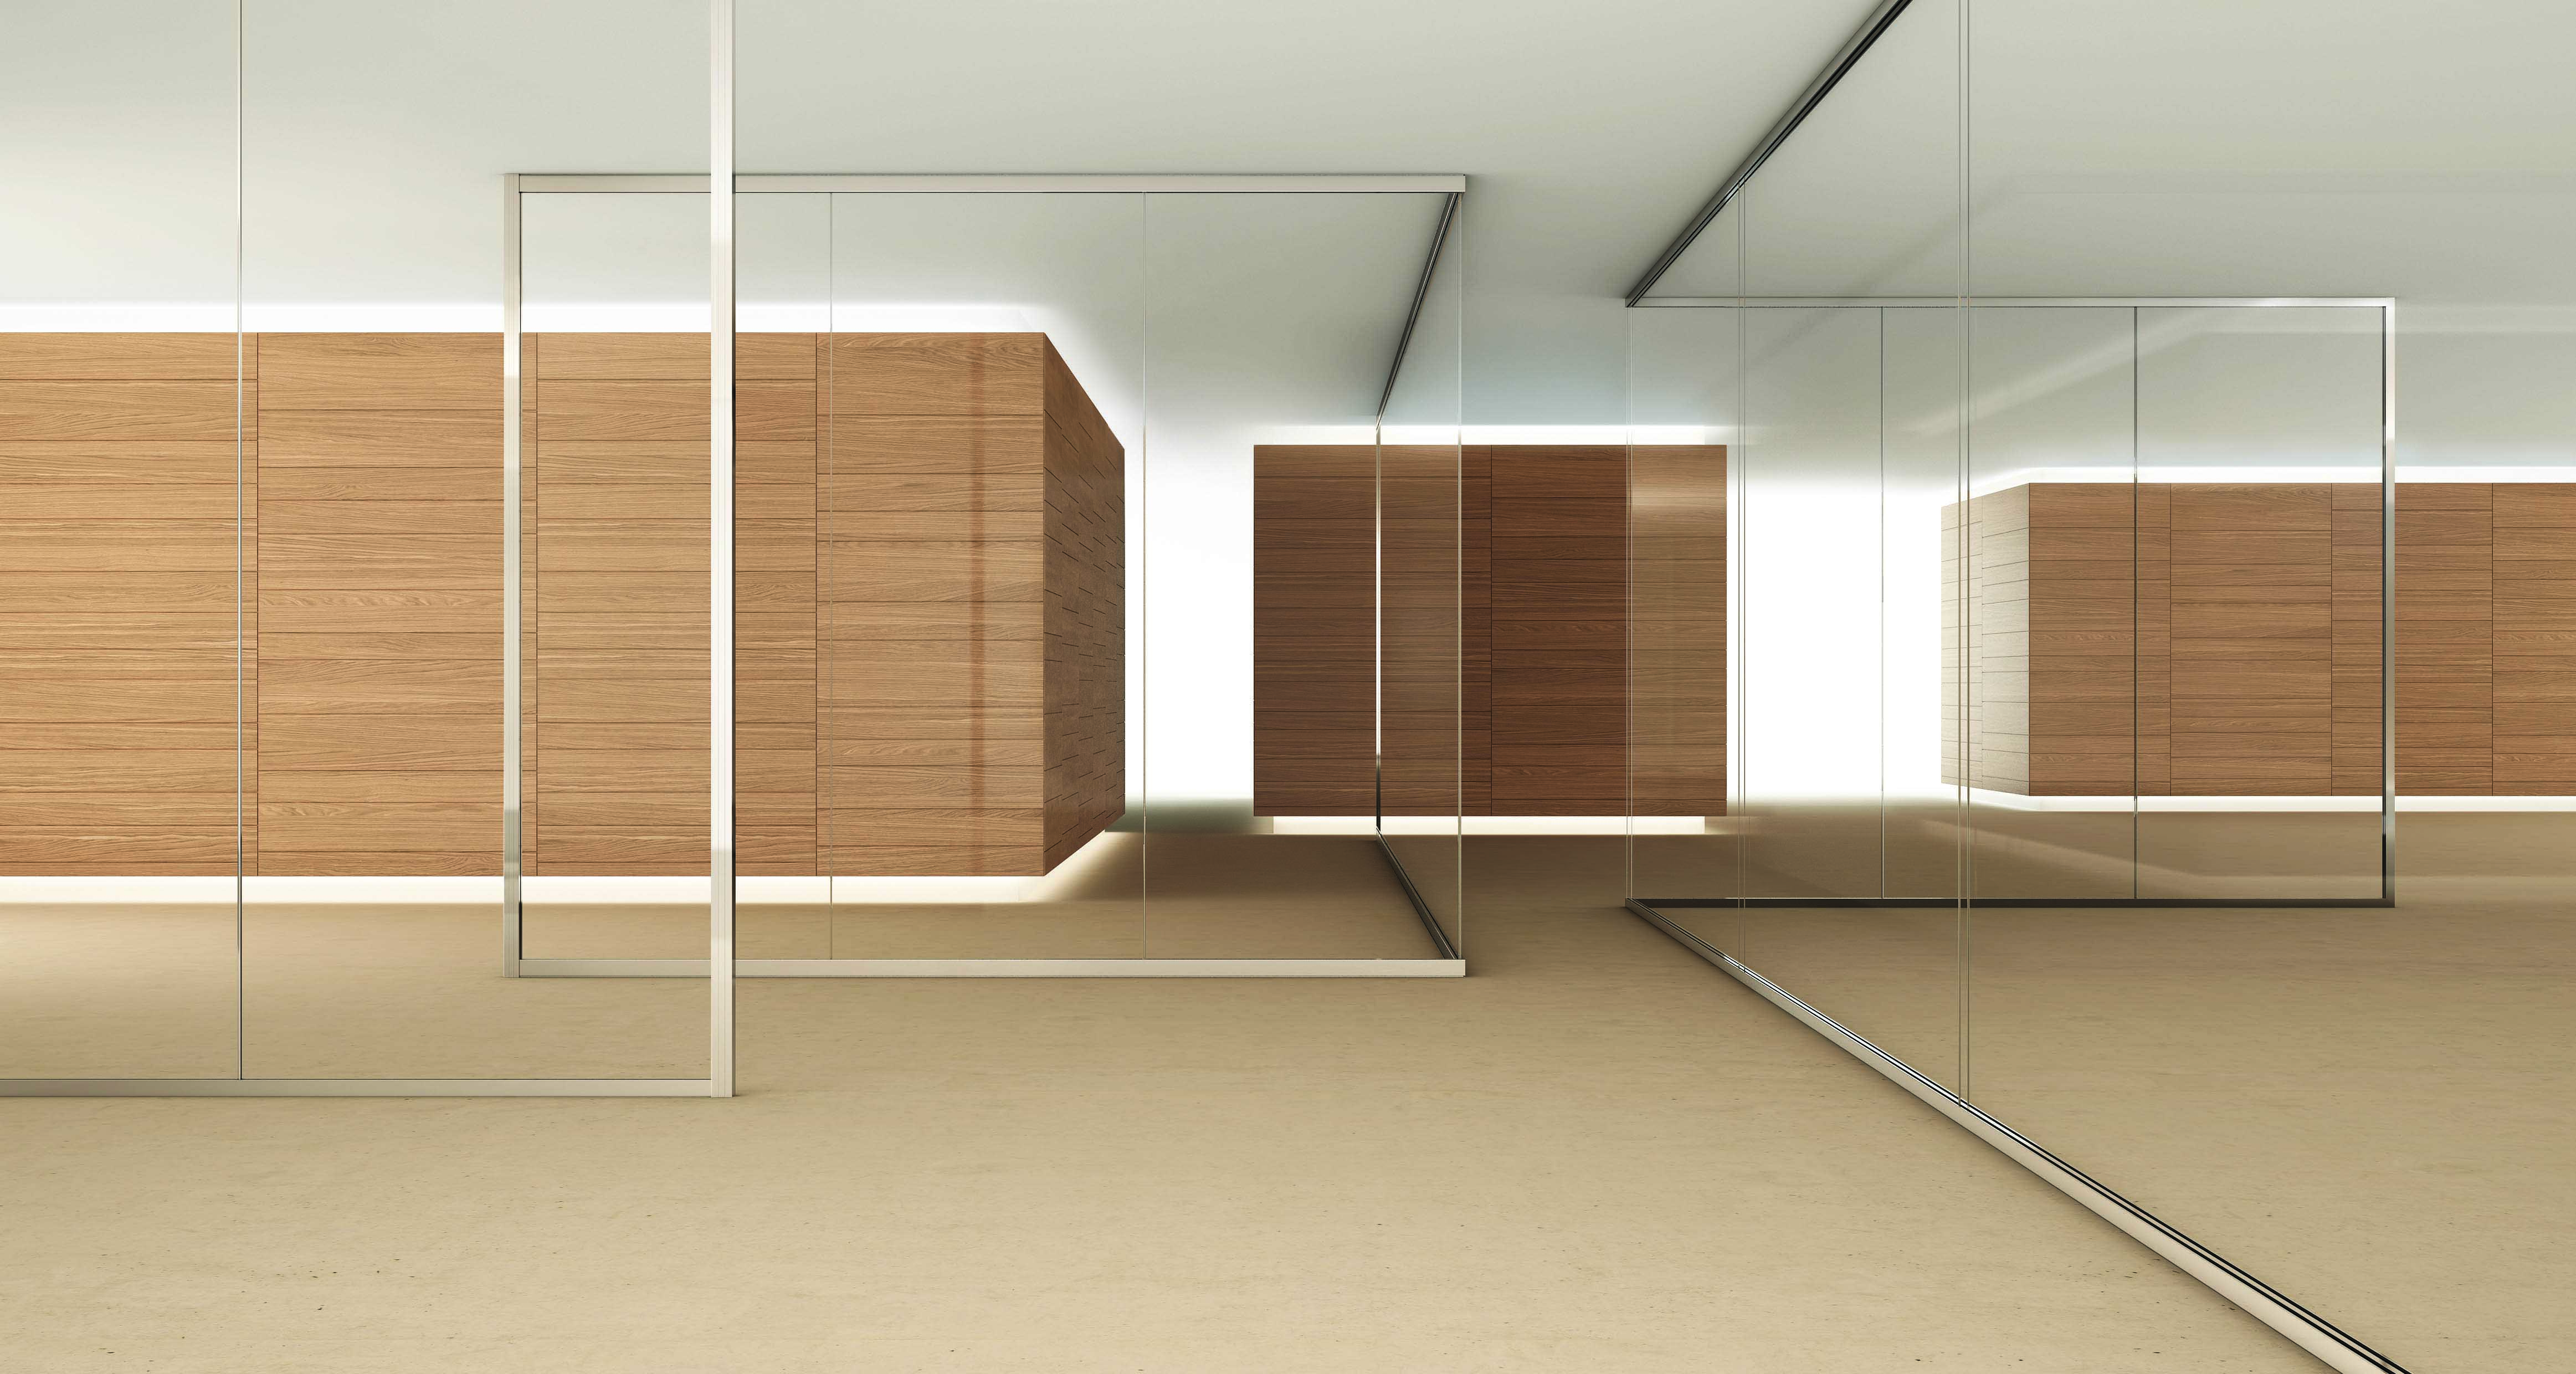 Tende Divisorie Per Interni Ikea Tende Divisorie Ikea Tenda